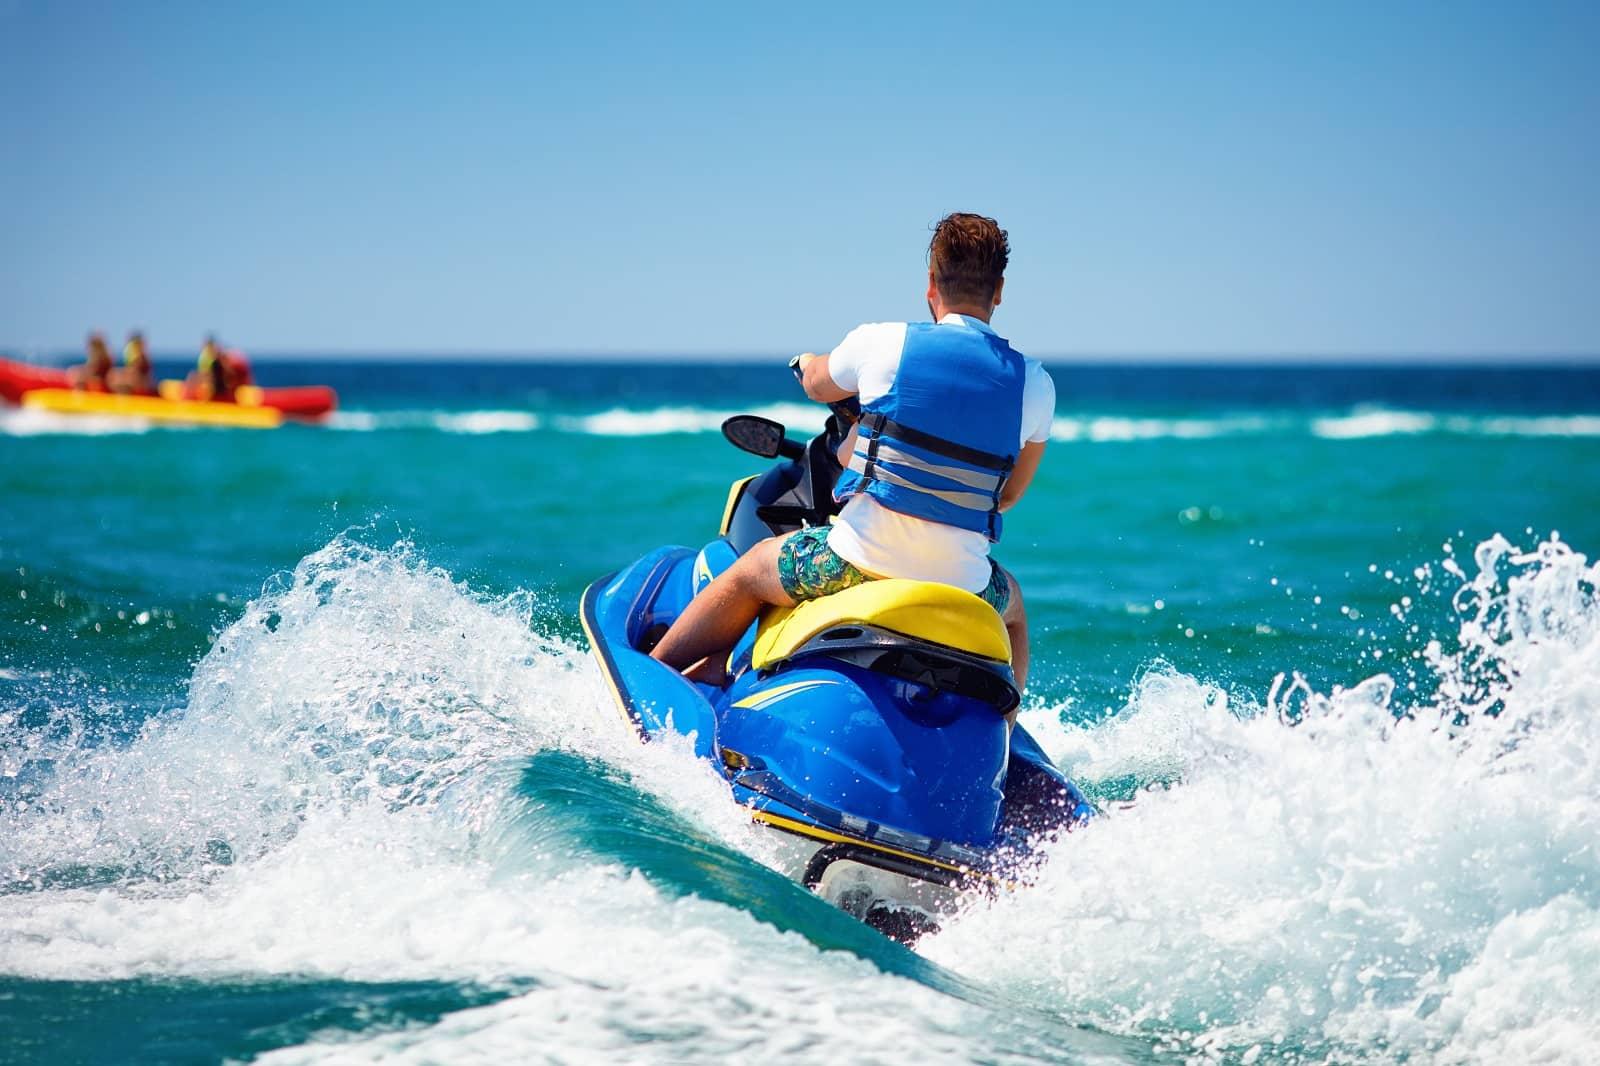 Back view of man riding jet ski